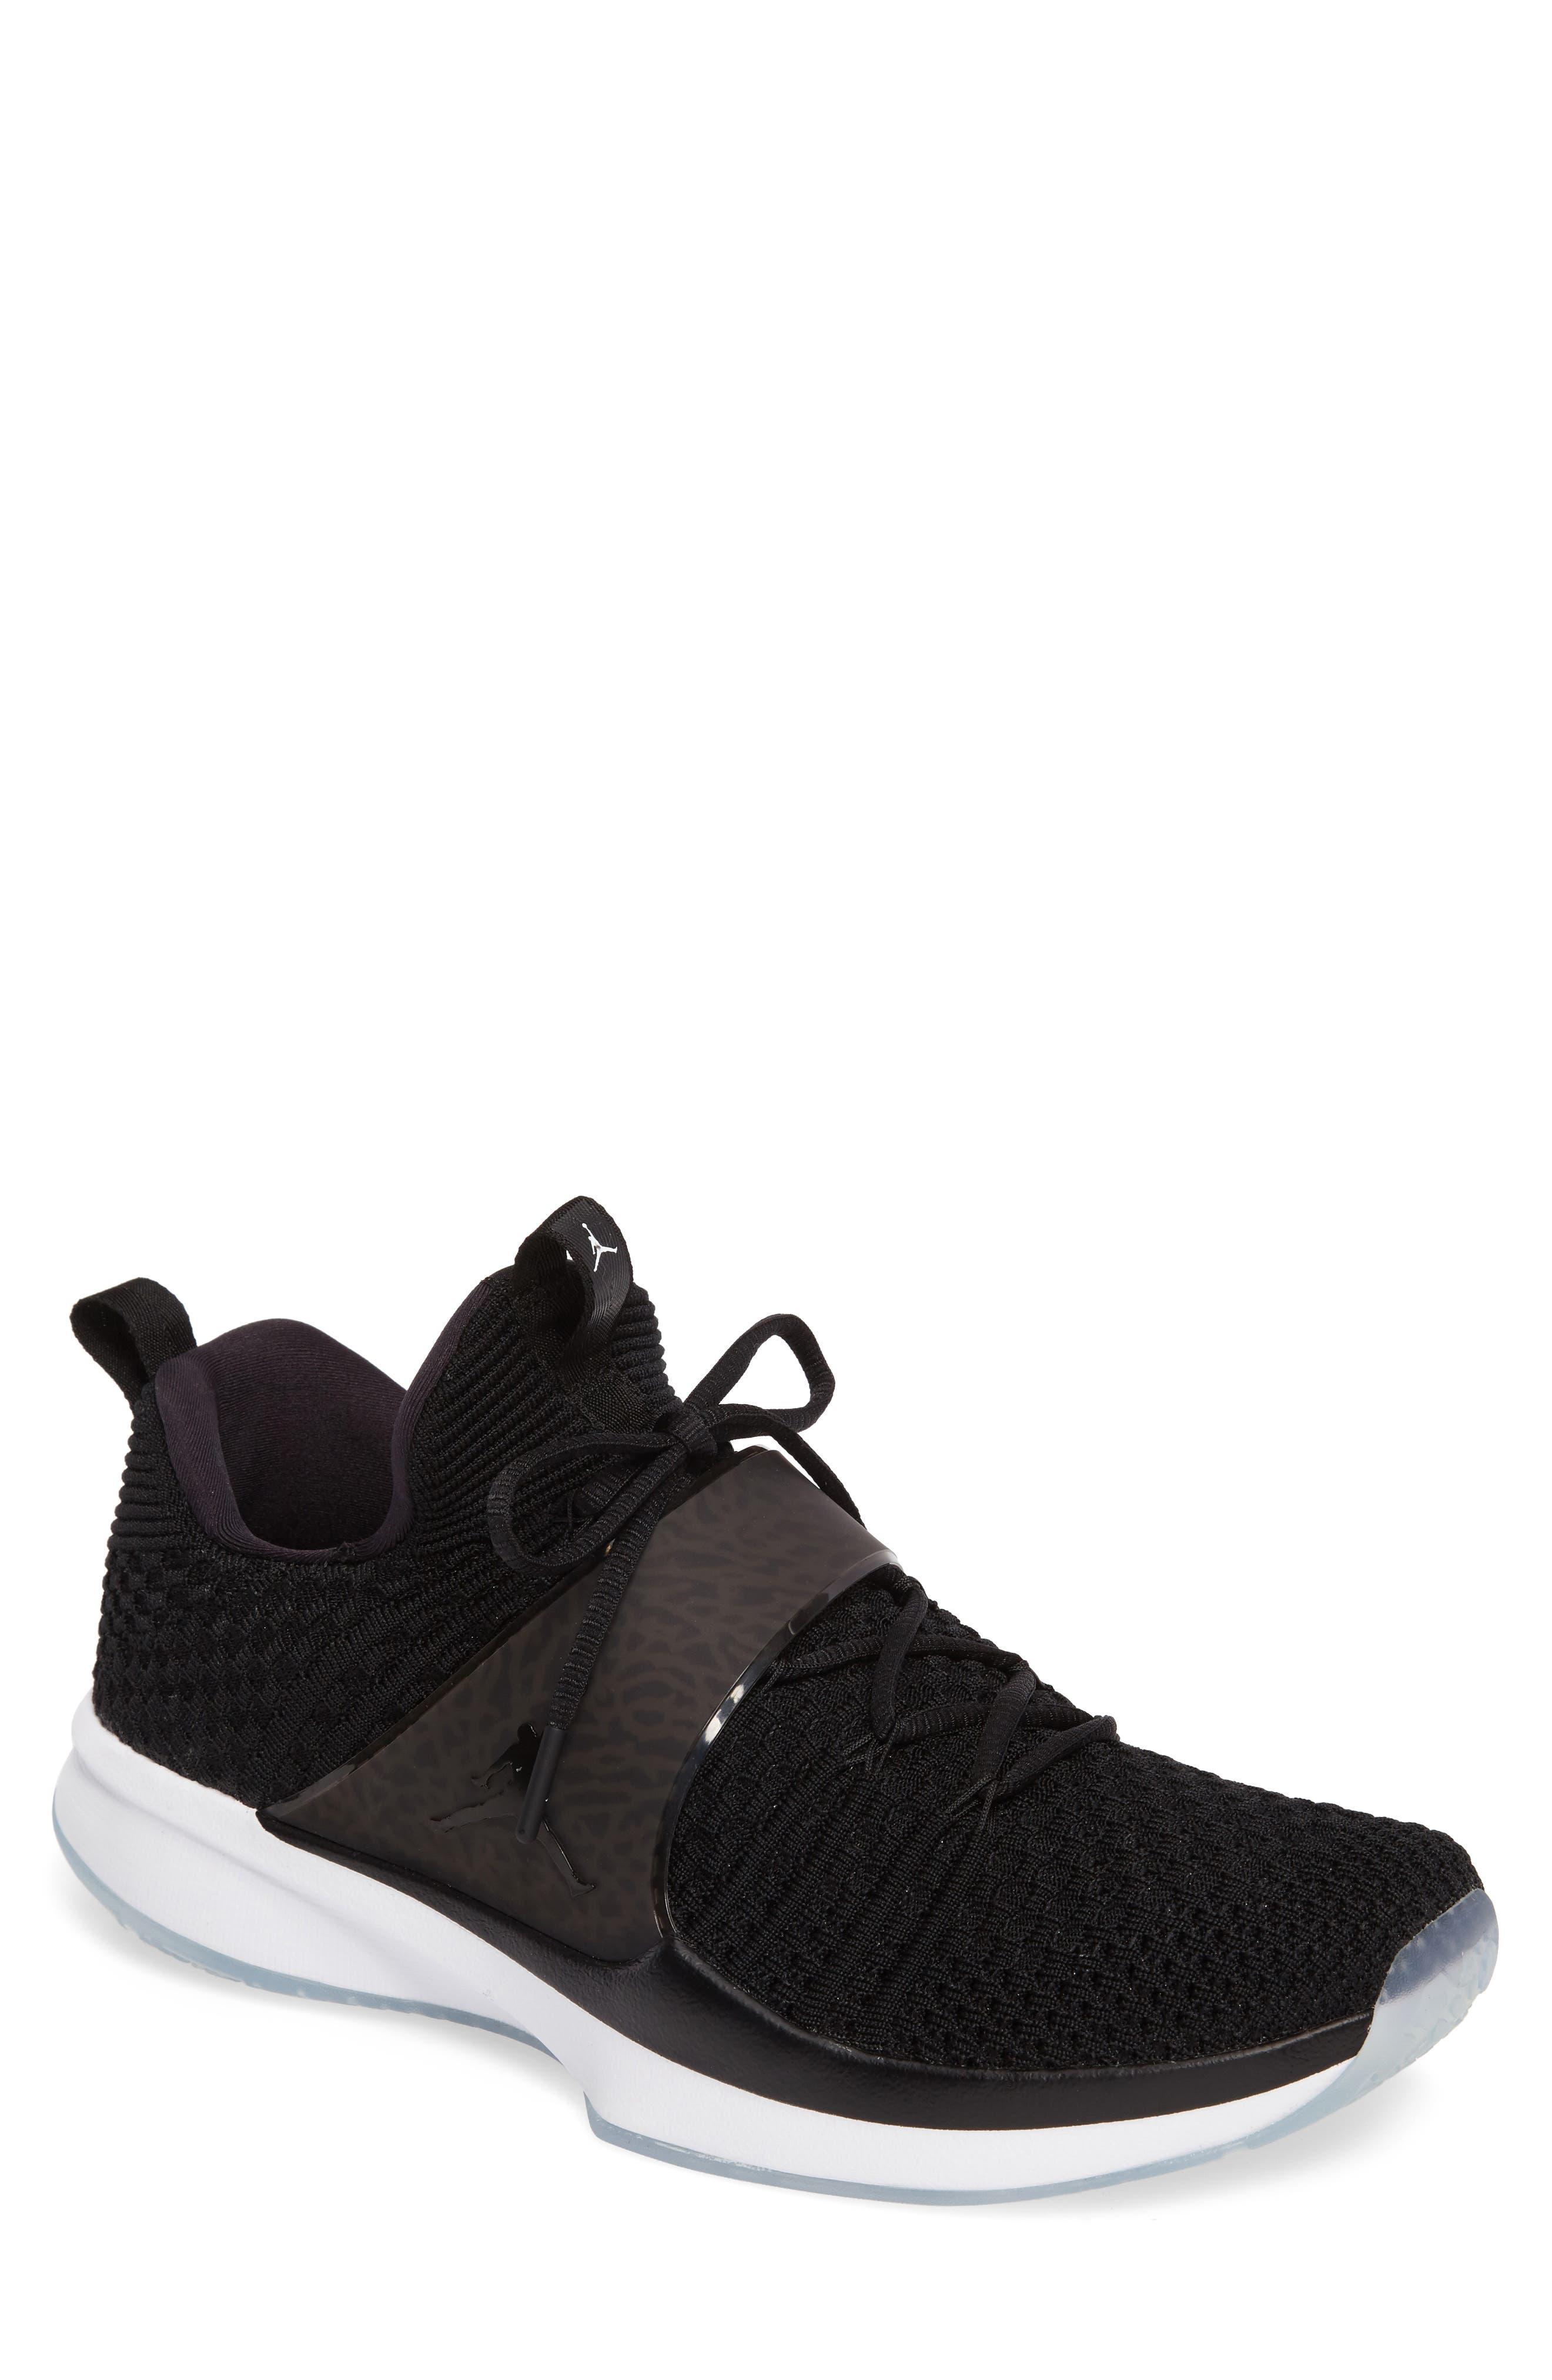 Jordan Flyknit Trainer 2 Low Sneaker,                         Main,                         color,